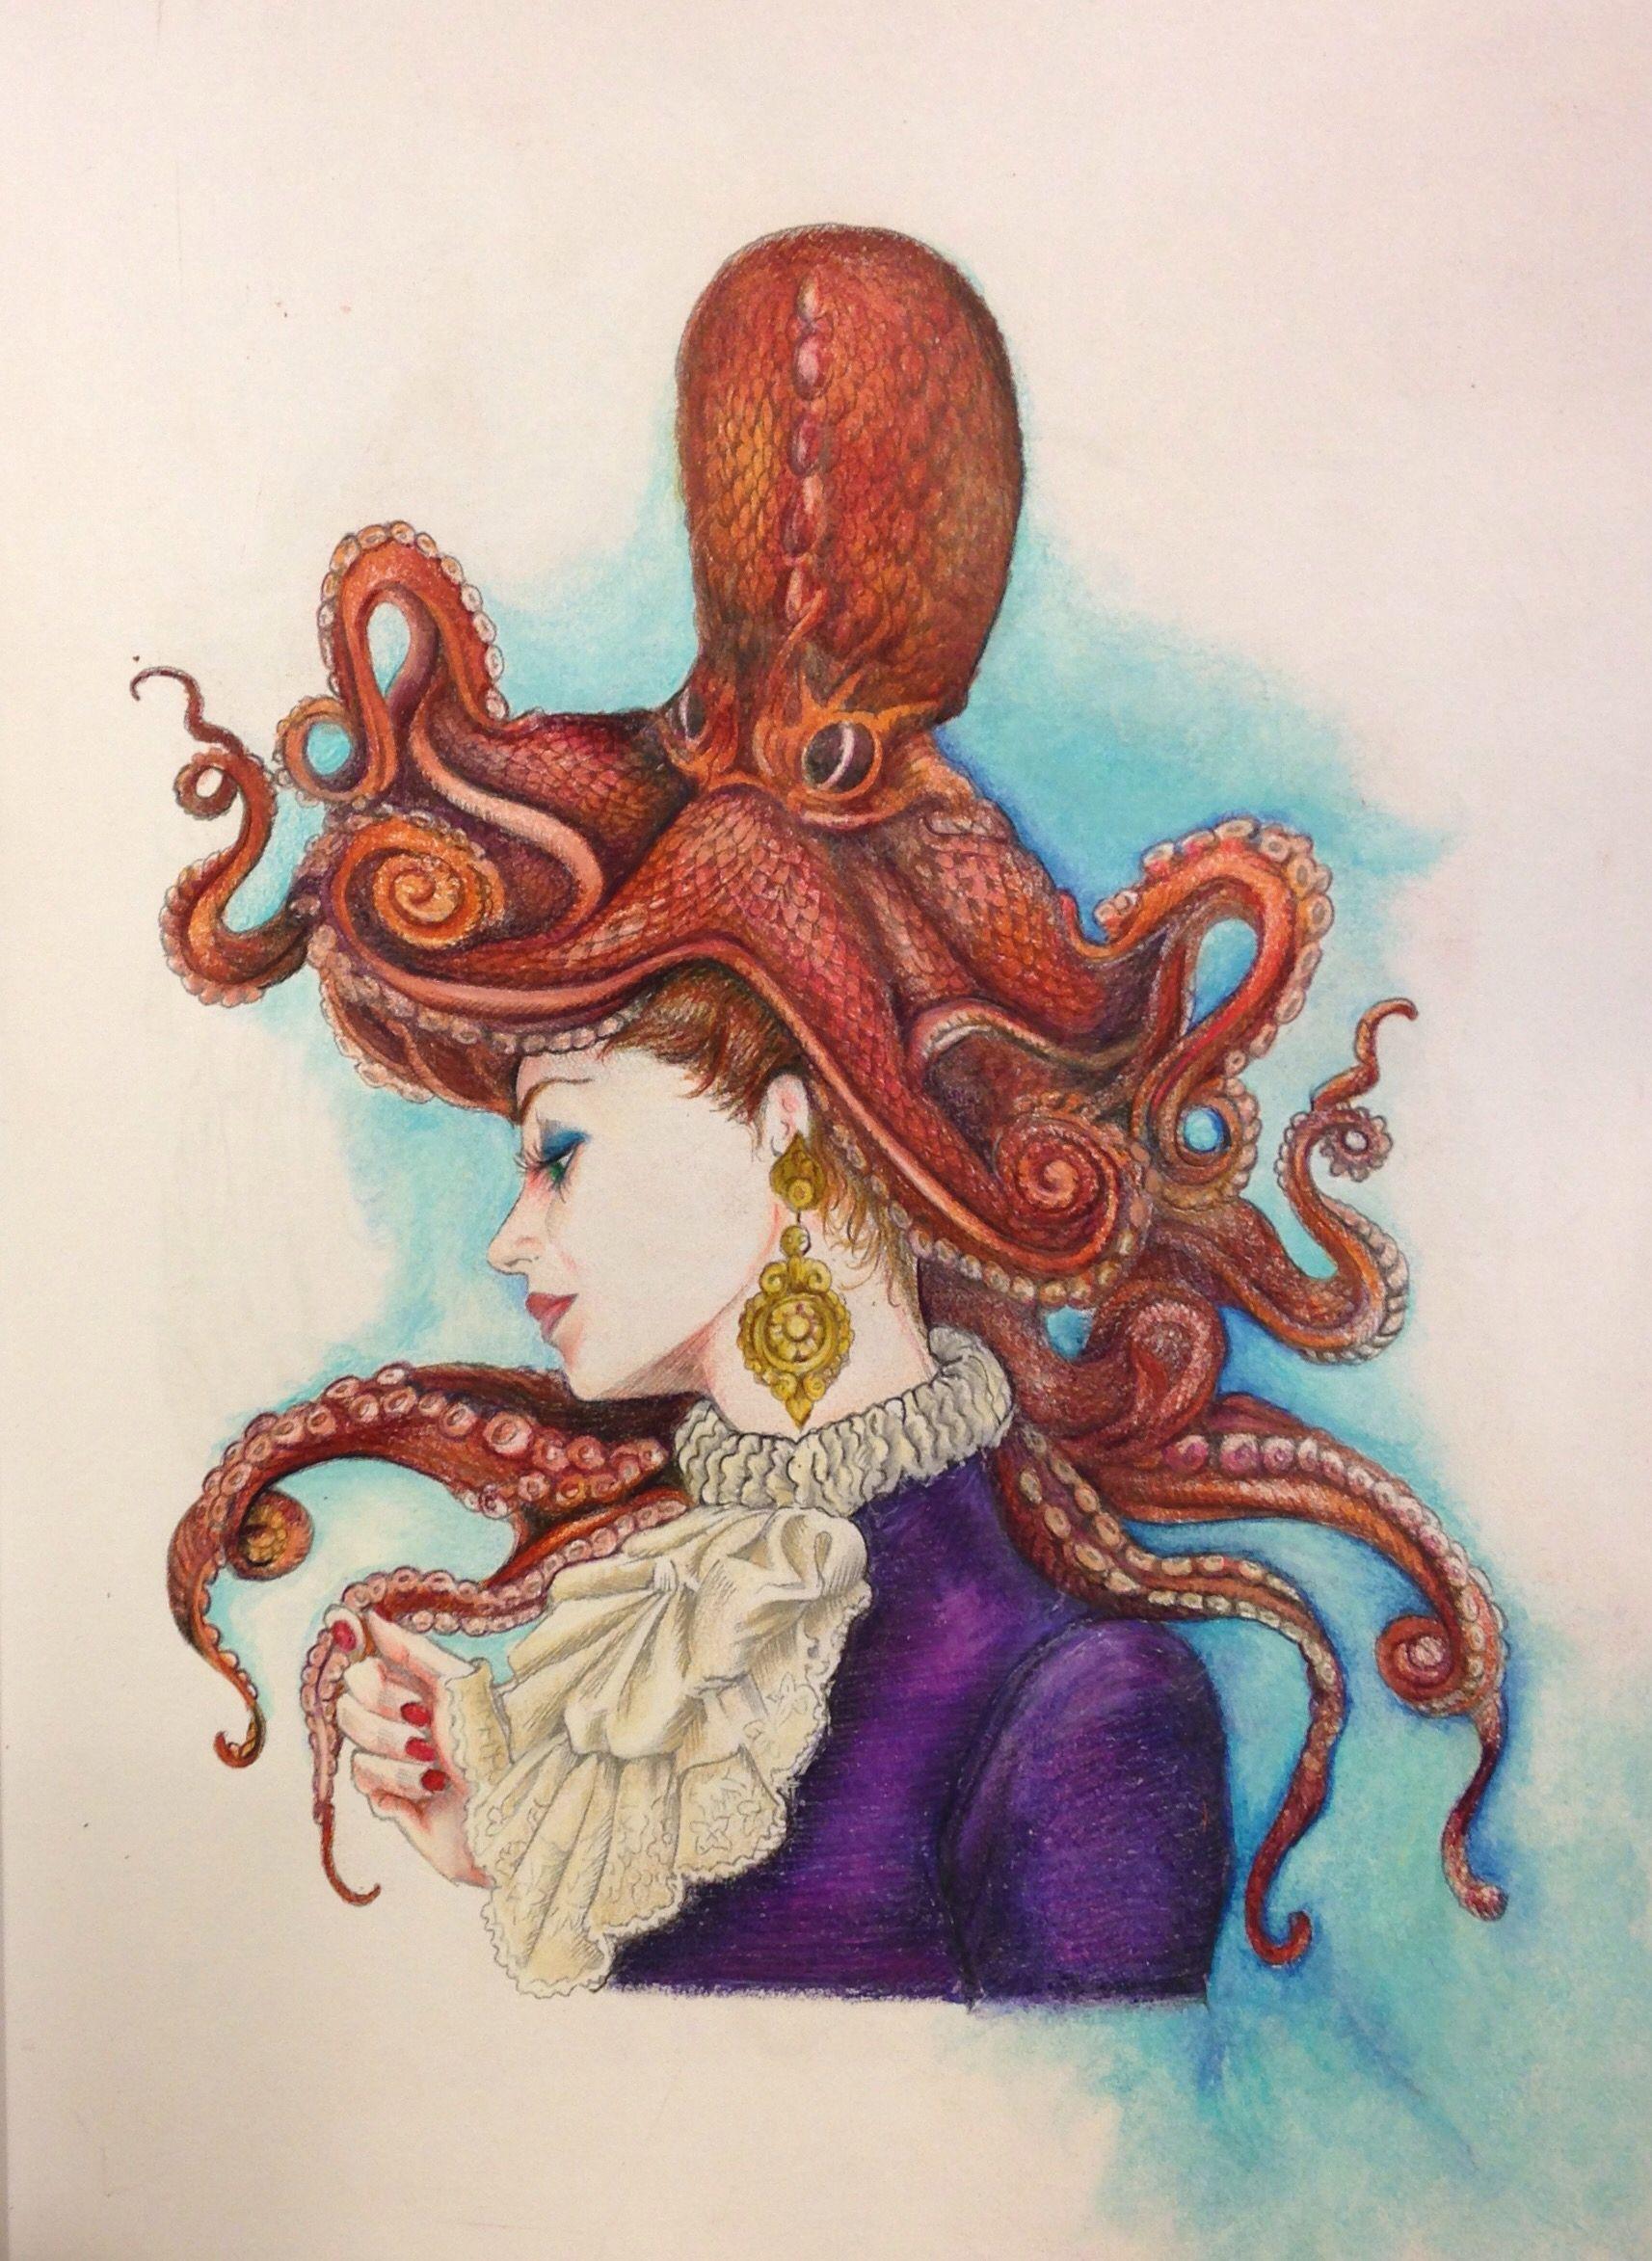 Octopus Hat   Coloring - Bennett Klein   Pinterest   Sketchbooks ...